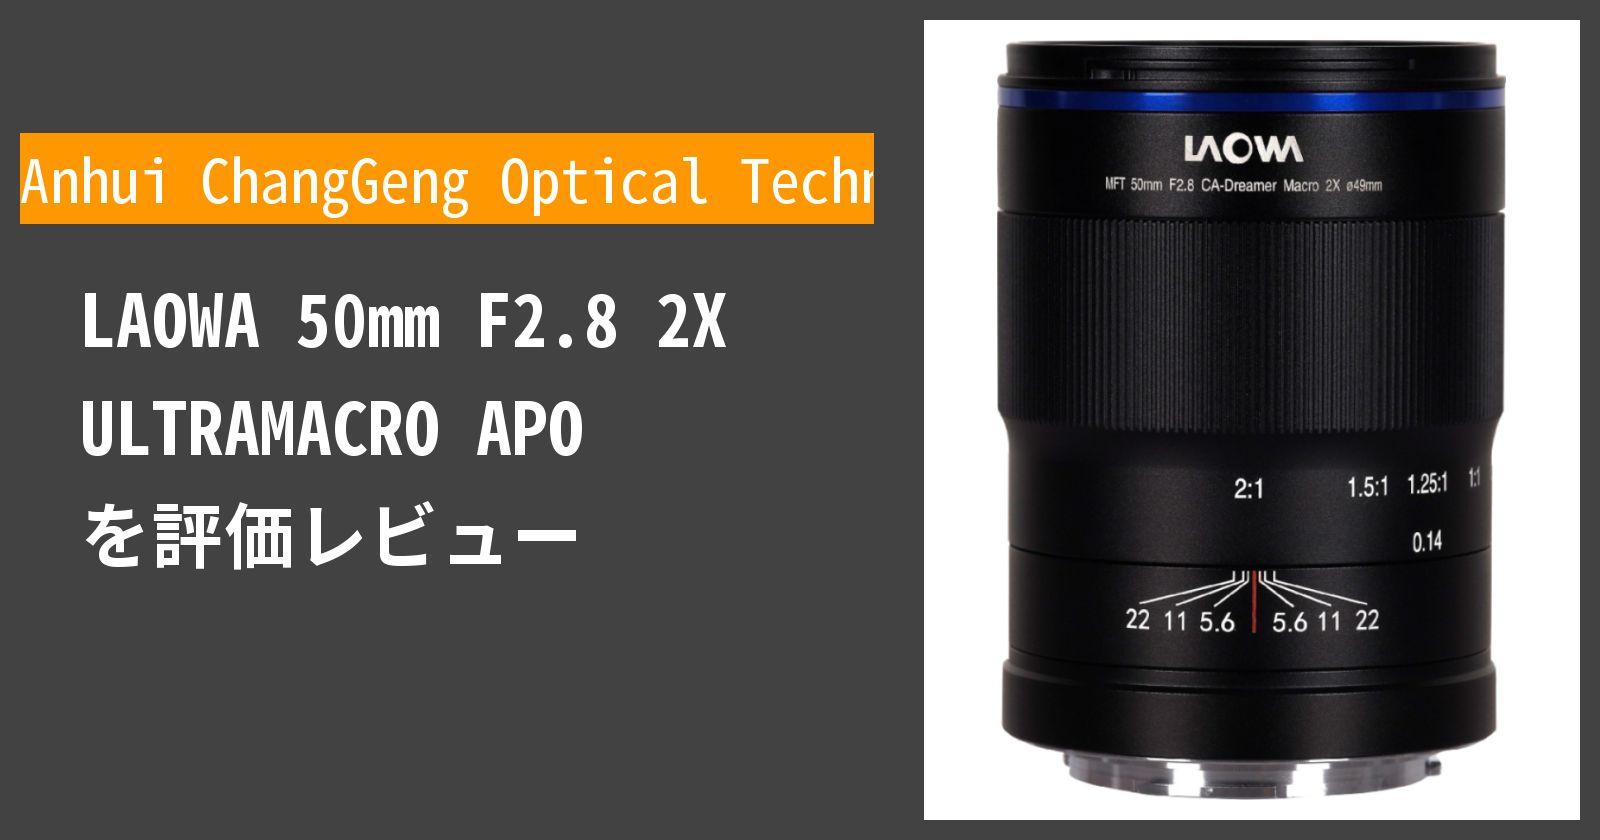 LAOWA 50mm F2.8 2X ULTRAMACRO APOを徹底評価